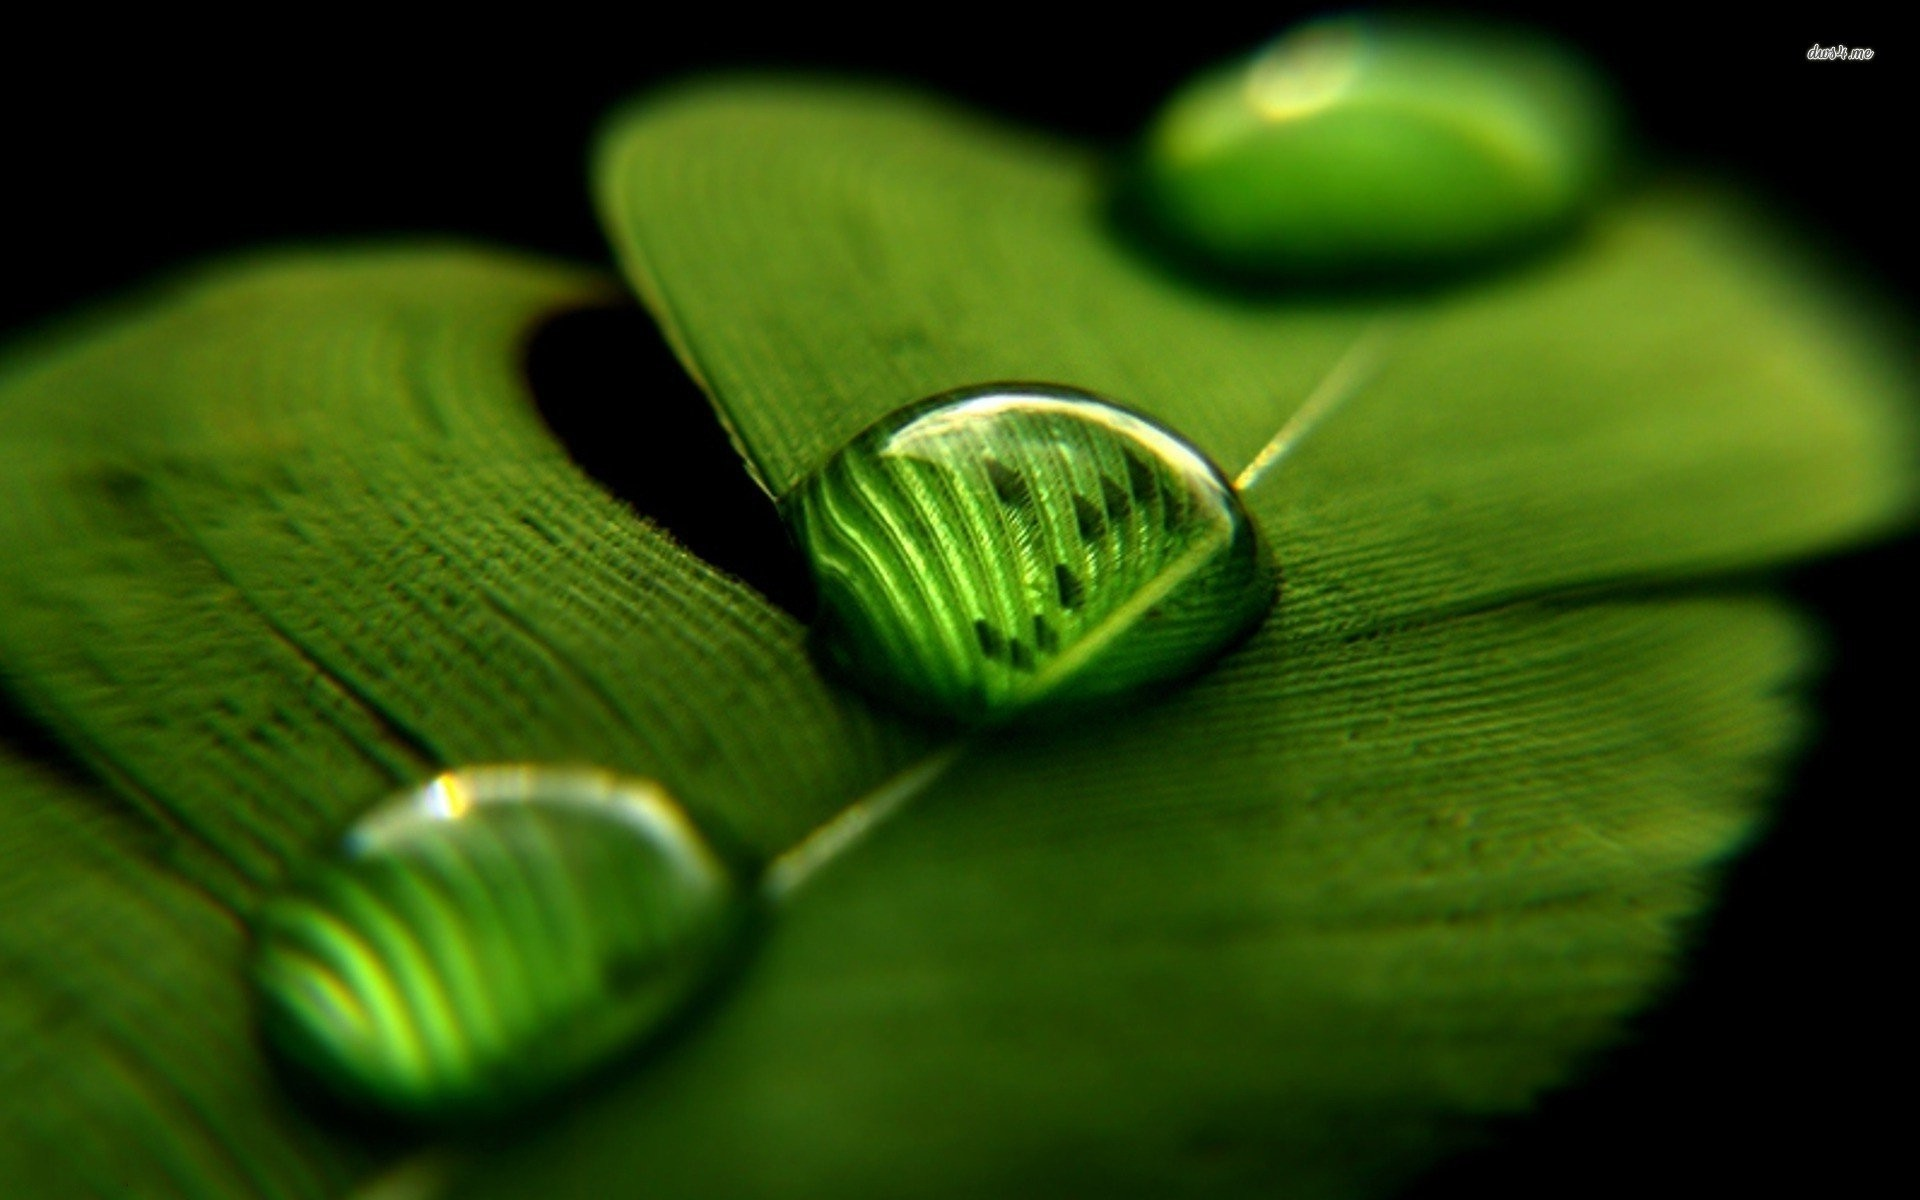 Cute Water Drops Leaf Wallpaper – Live Wallpaper HD